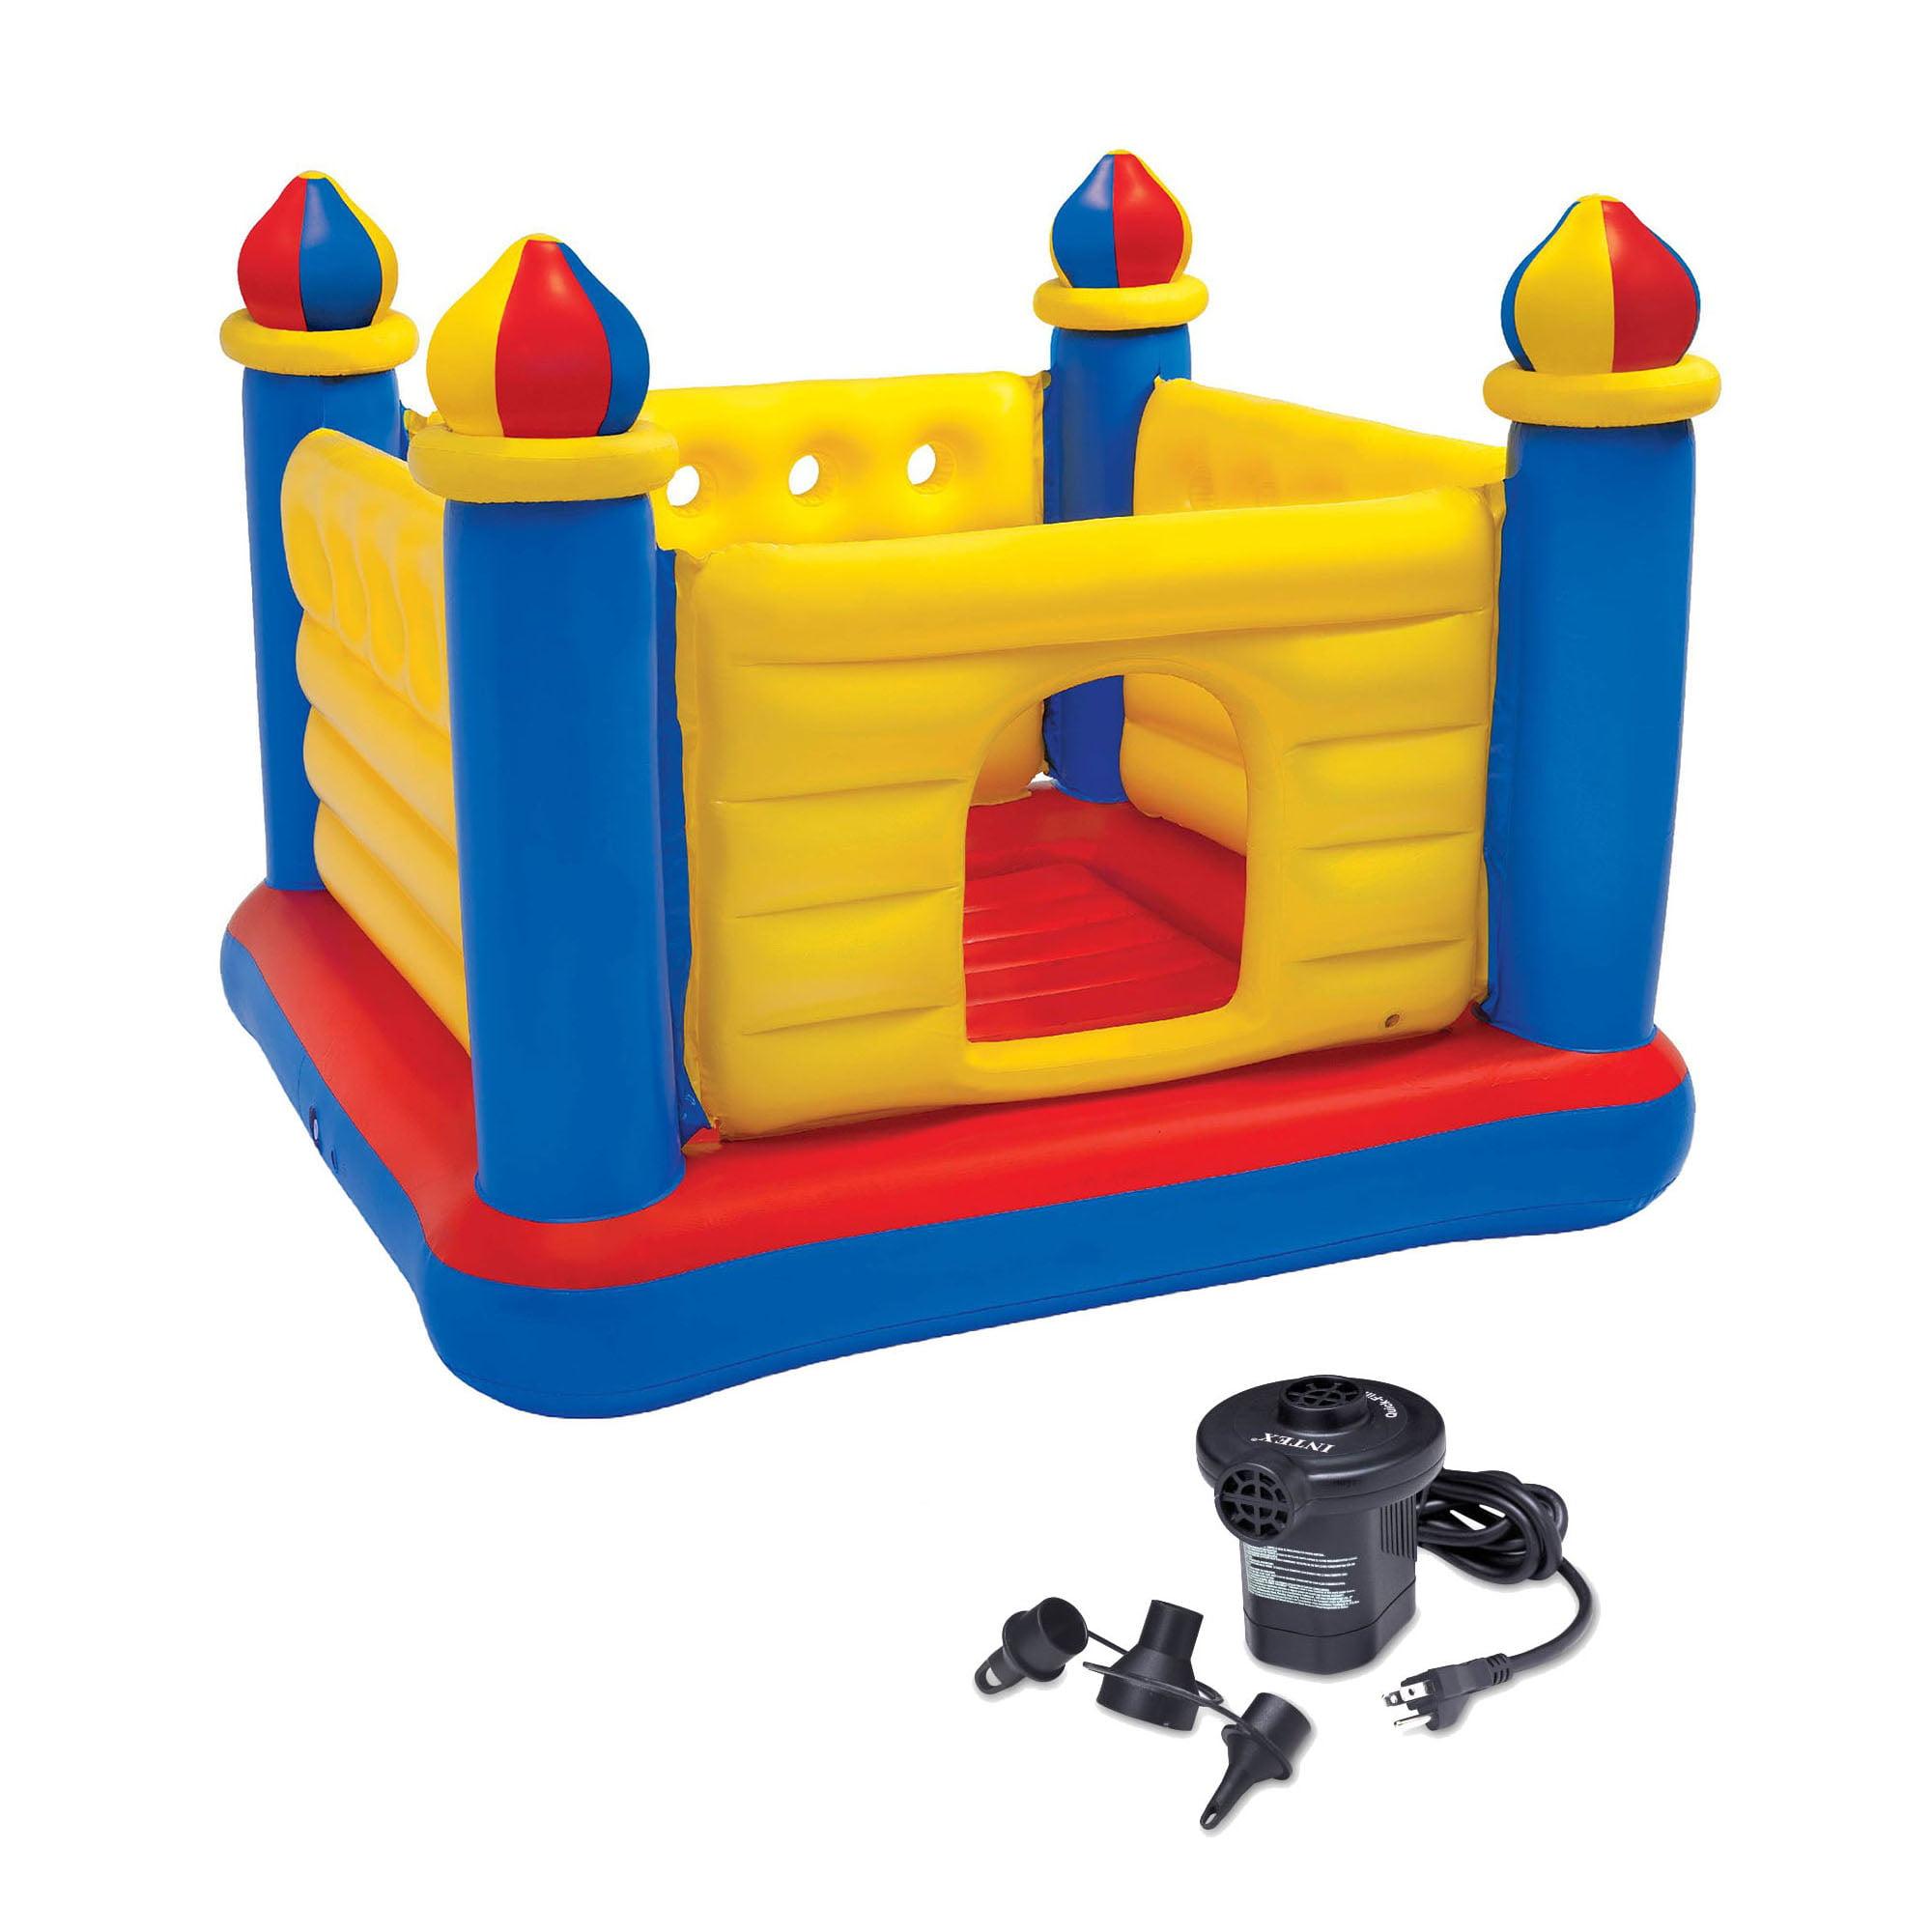 INTEX Inflatable Jump-O-Lene Ball Pit Castle Bouncer & Quick Fill Air Pump